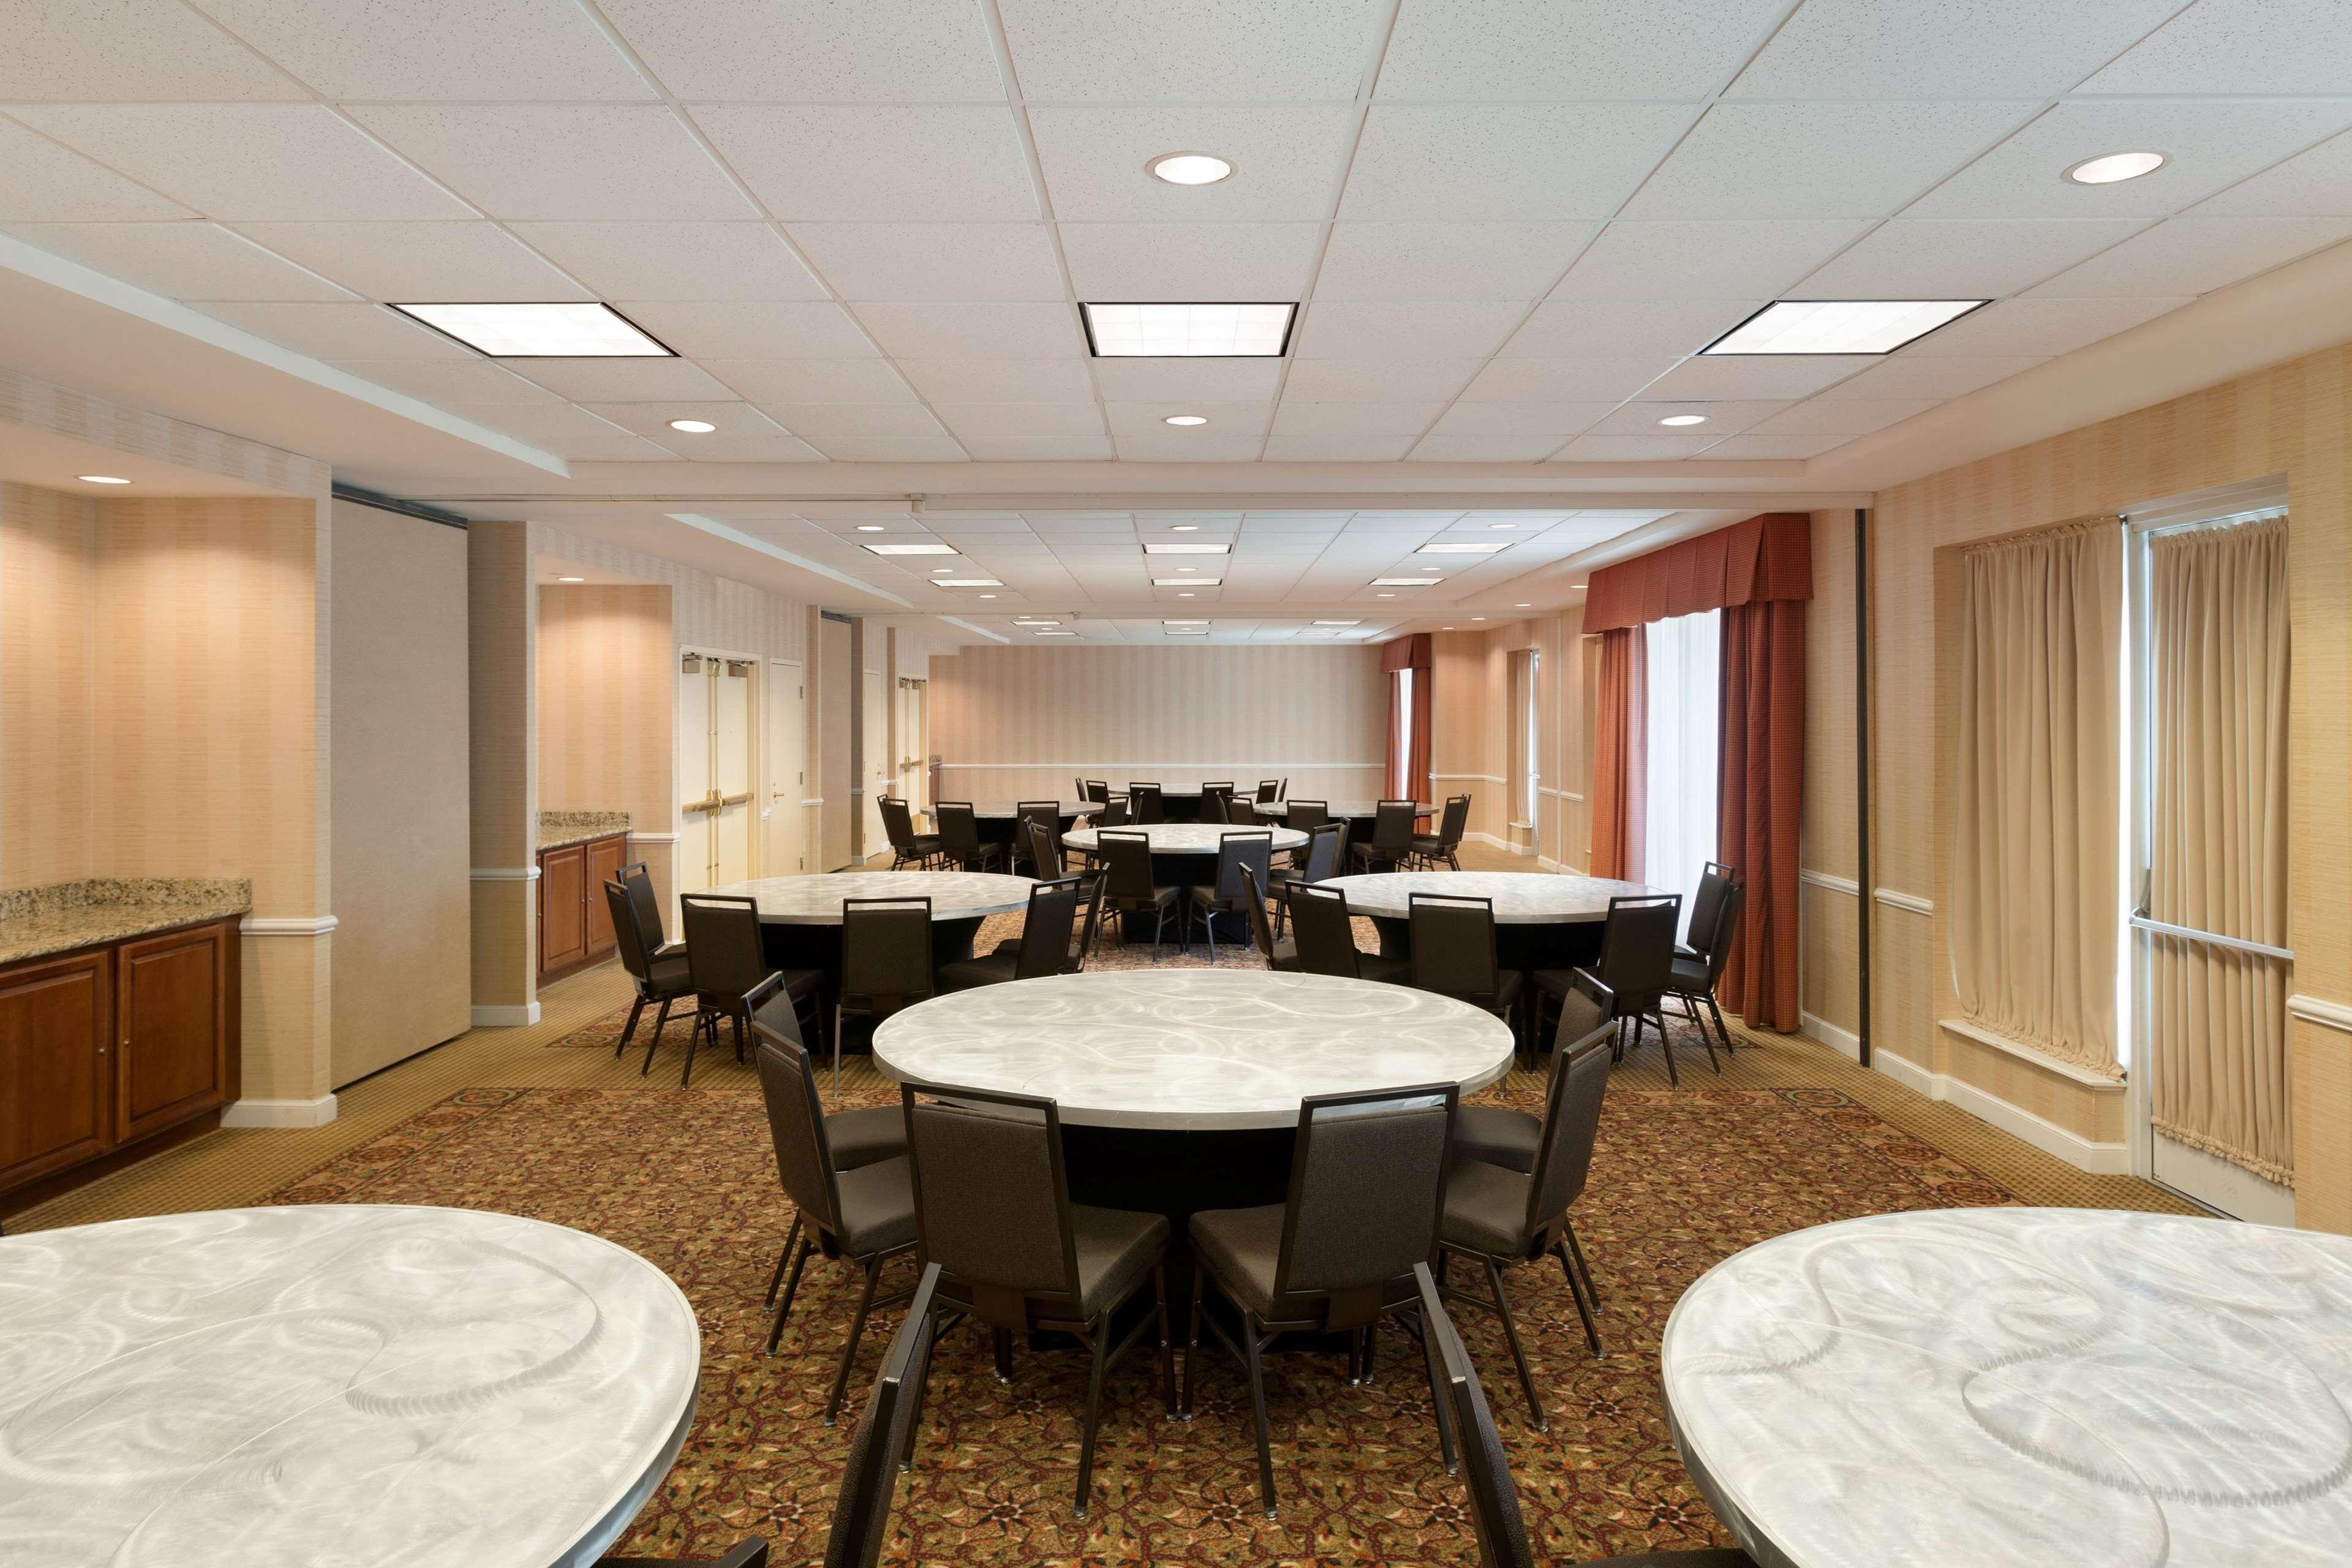 Hilton Garden Inn Chicago/Oakbrook Terrace image 15